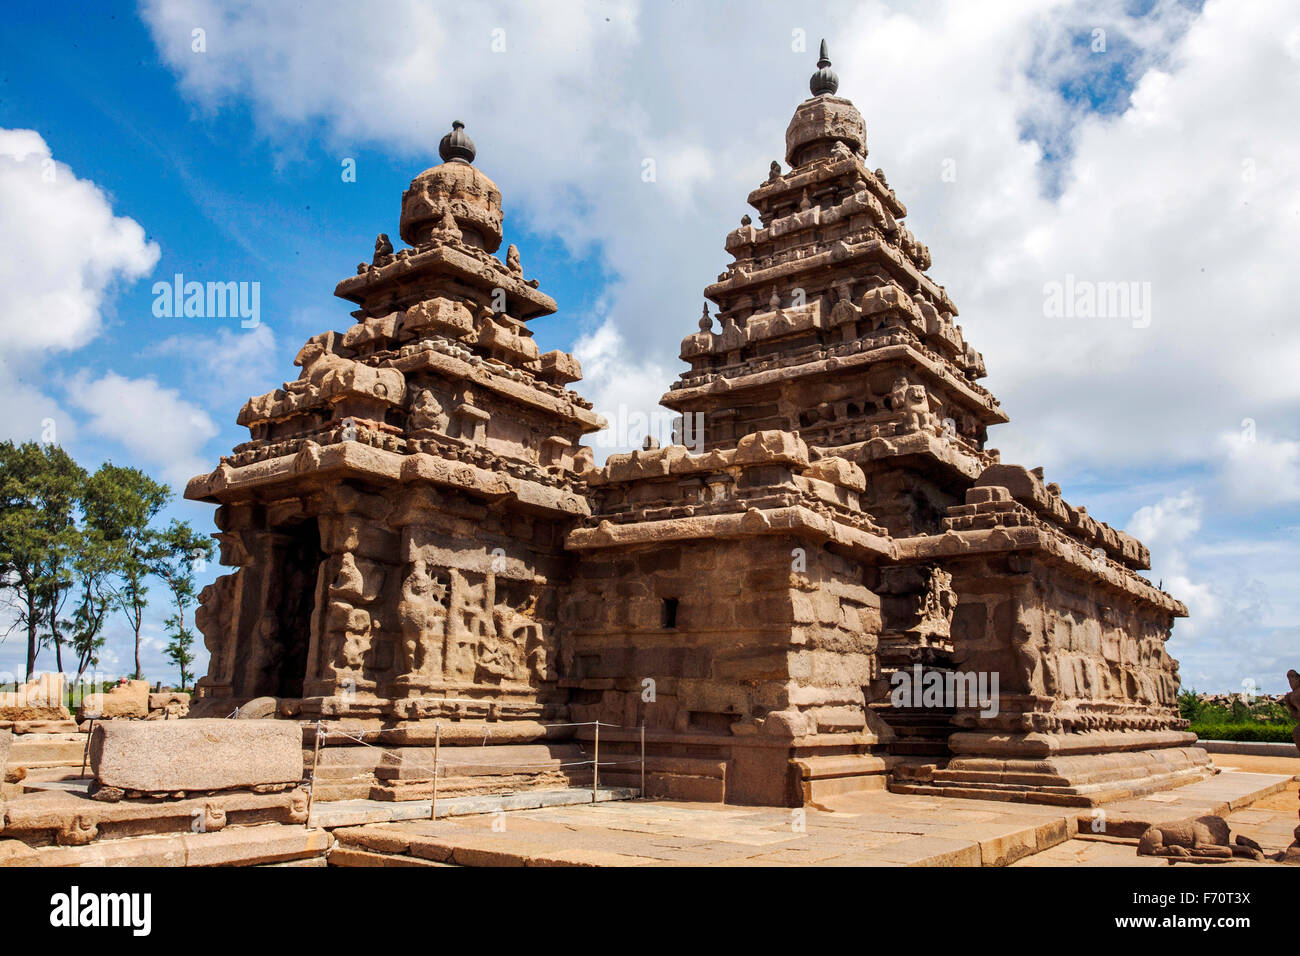 Mahabalipuram templo, Tamilnadu, India, Asia Foto de stock